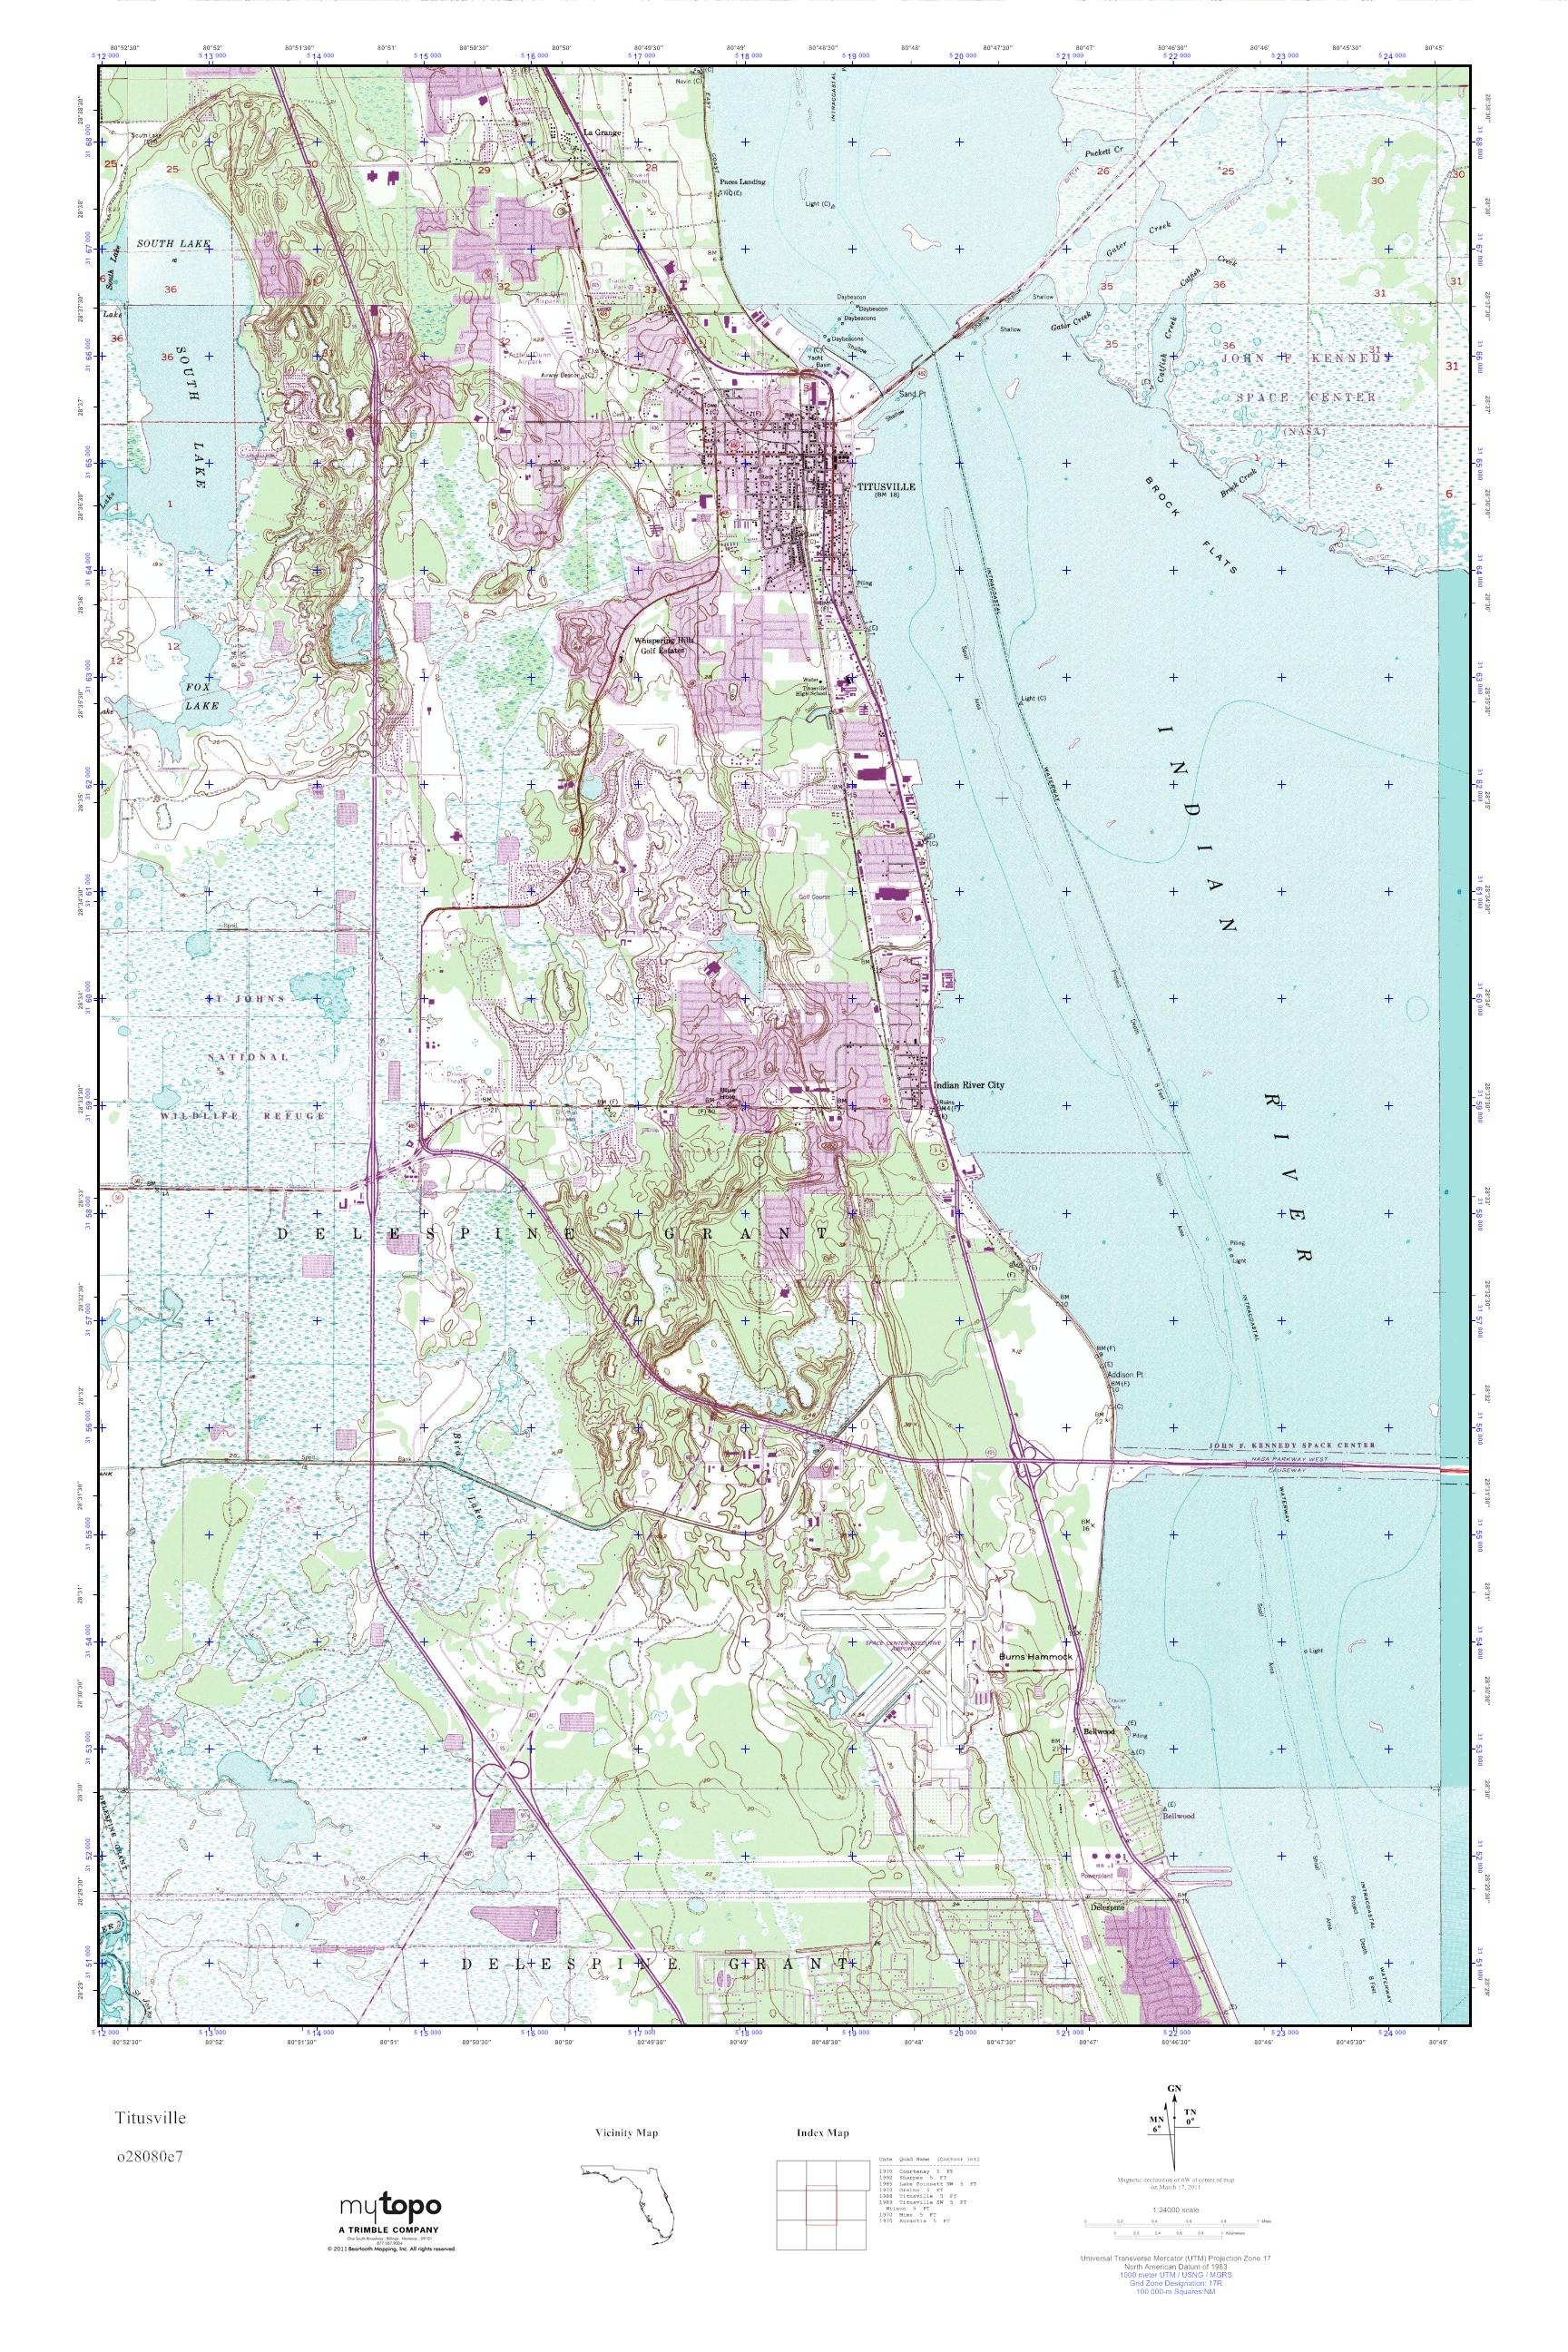 Titusville Florida Map.Mytopo Titusville Florida Usgs Quad Topo Map